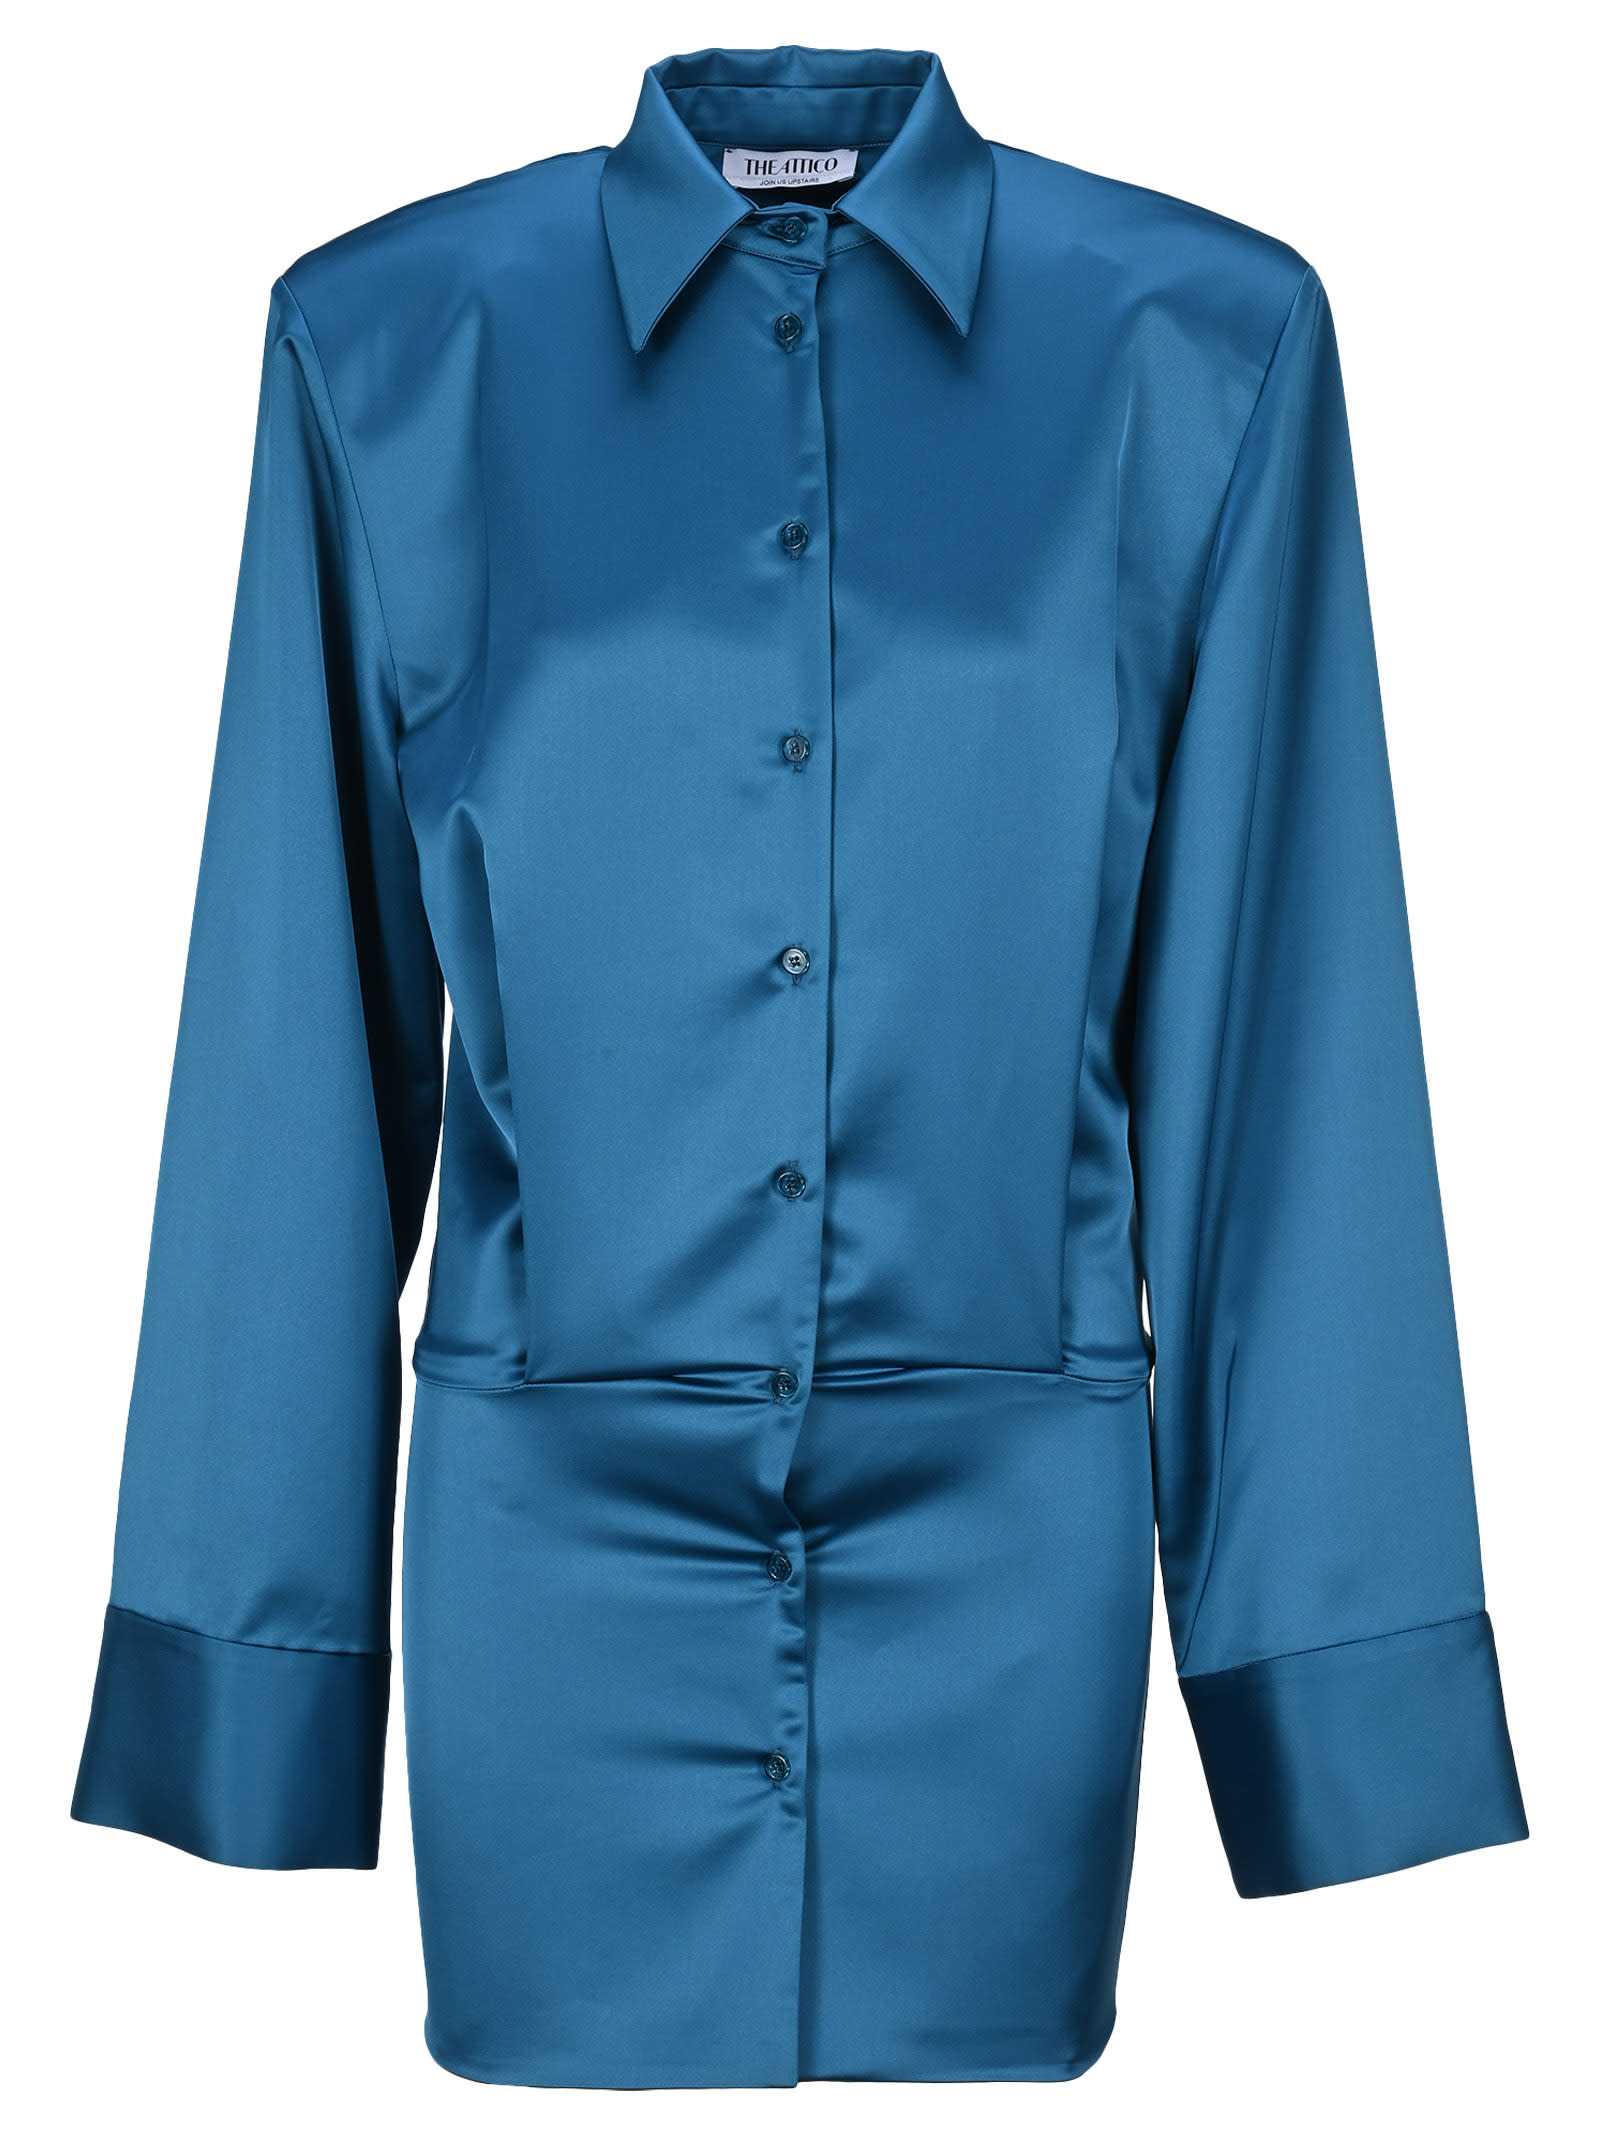 Attico ATTICO MARGOT MINI SHIRT DRESS